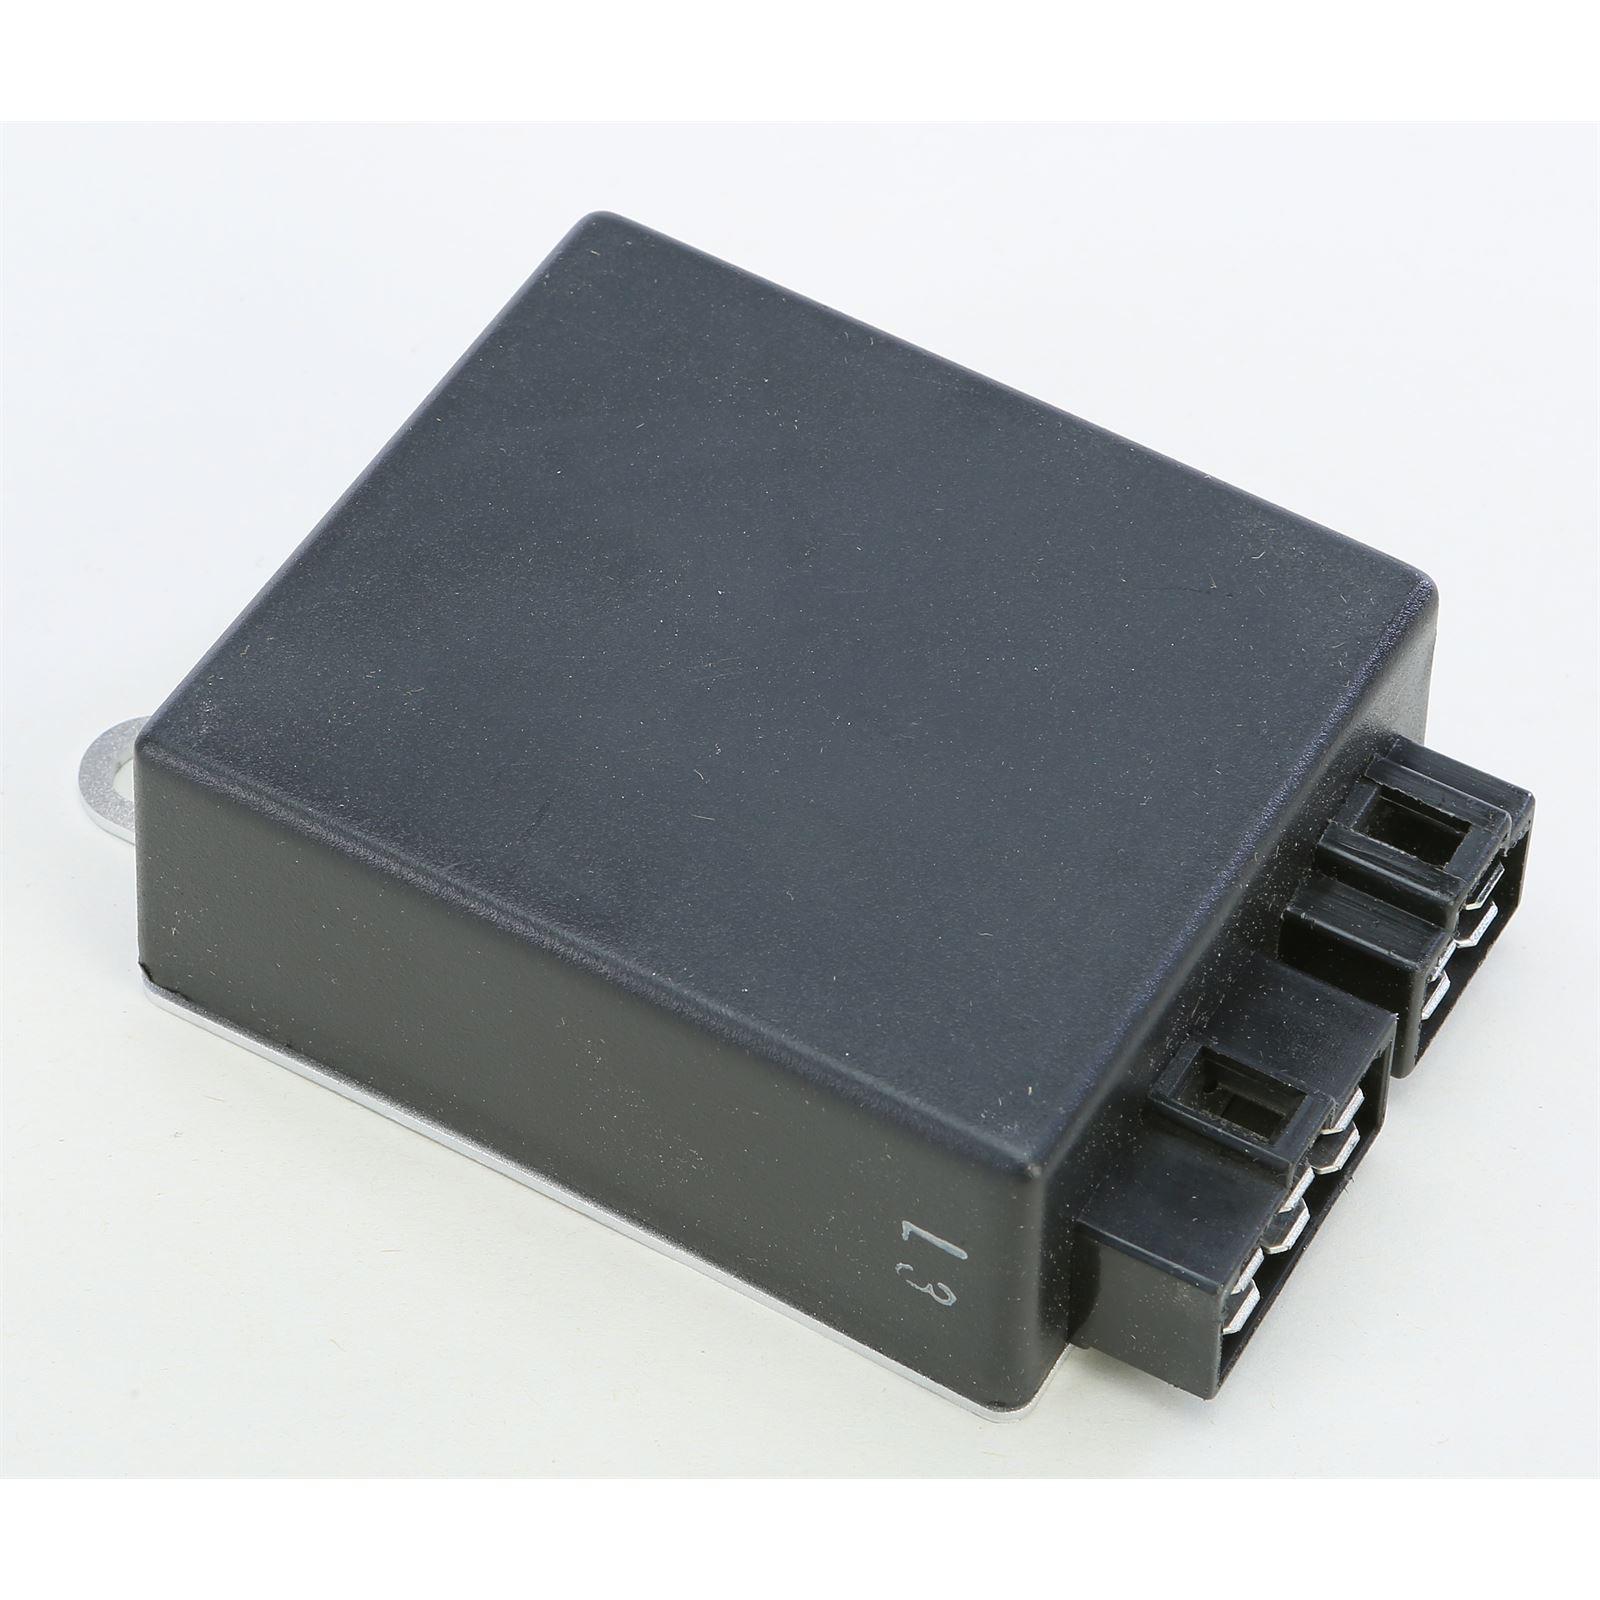 Ricks CDI Box